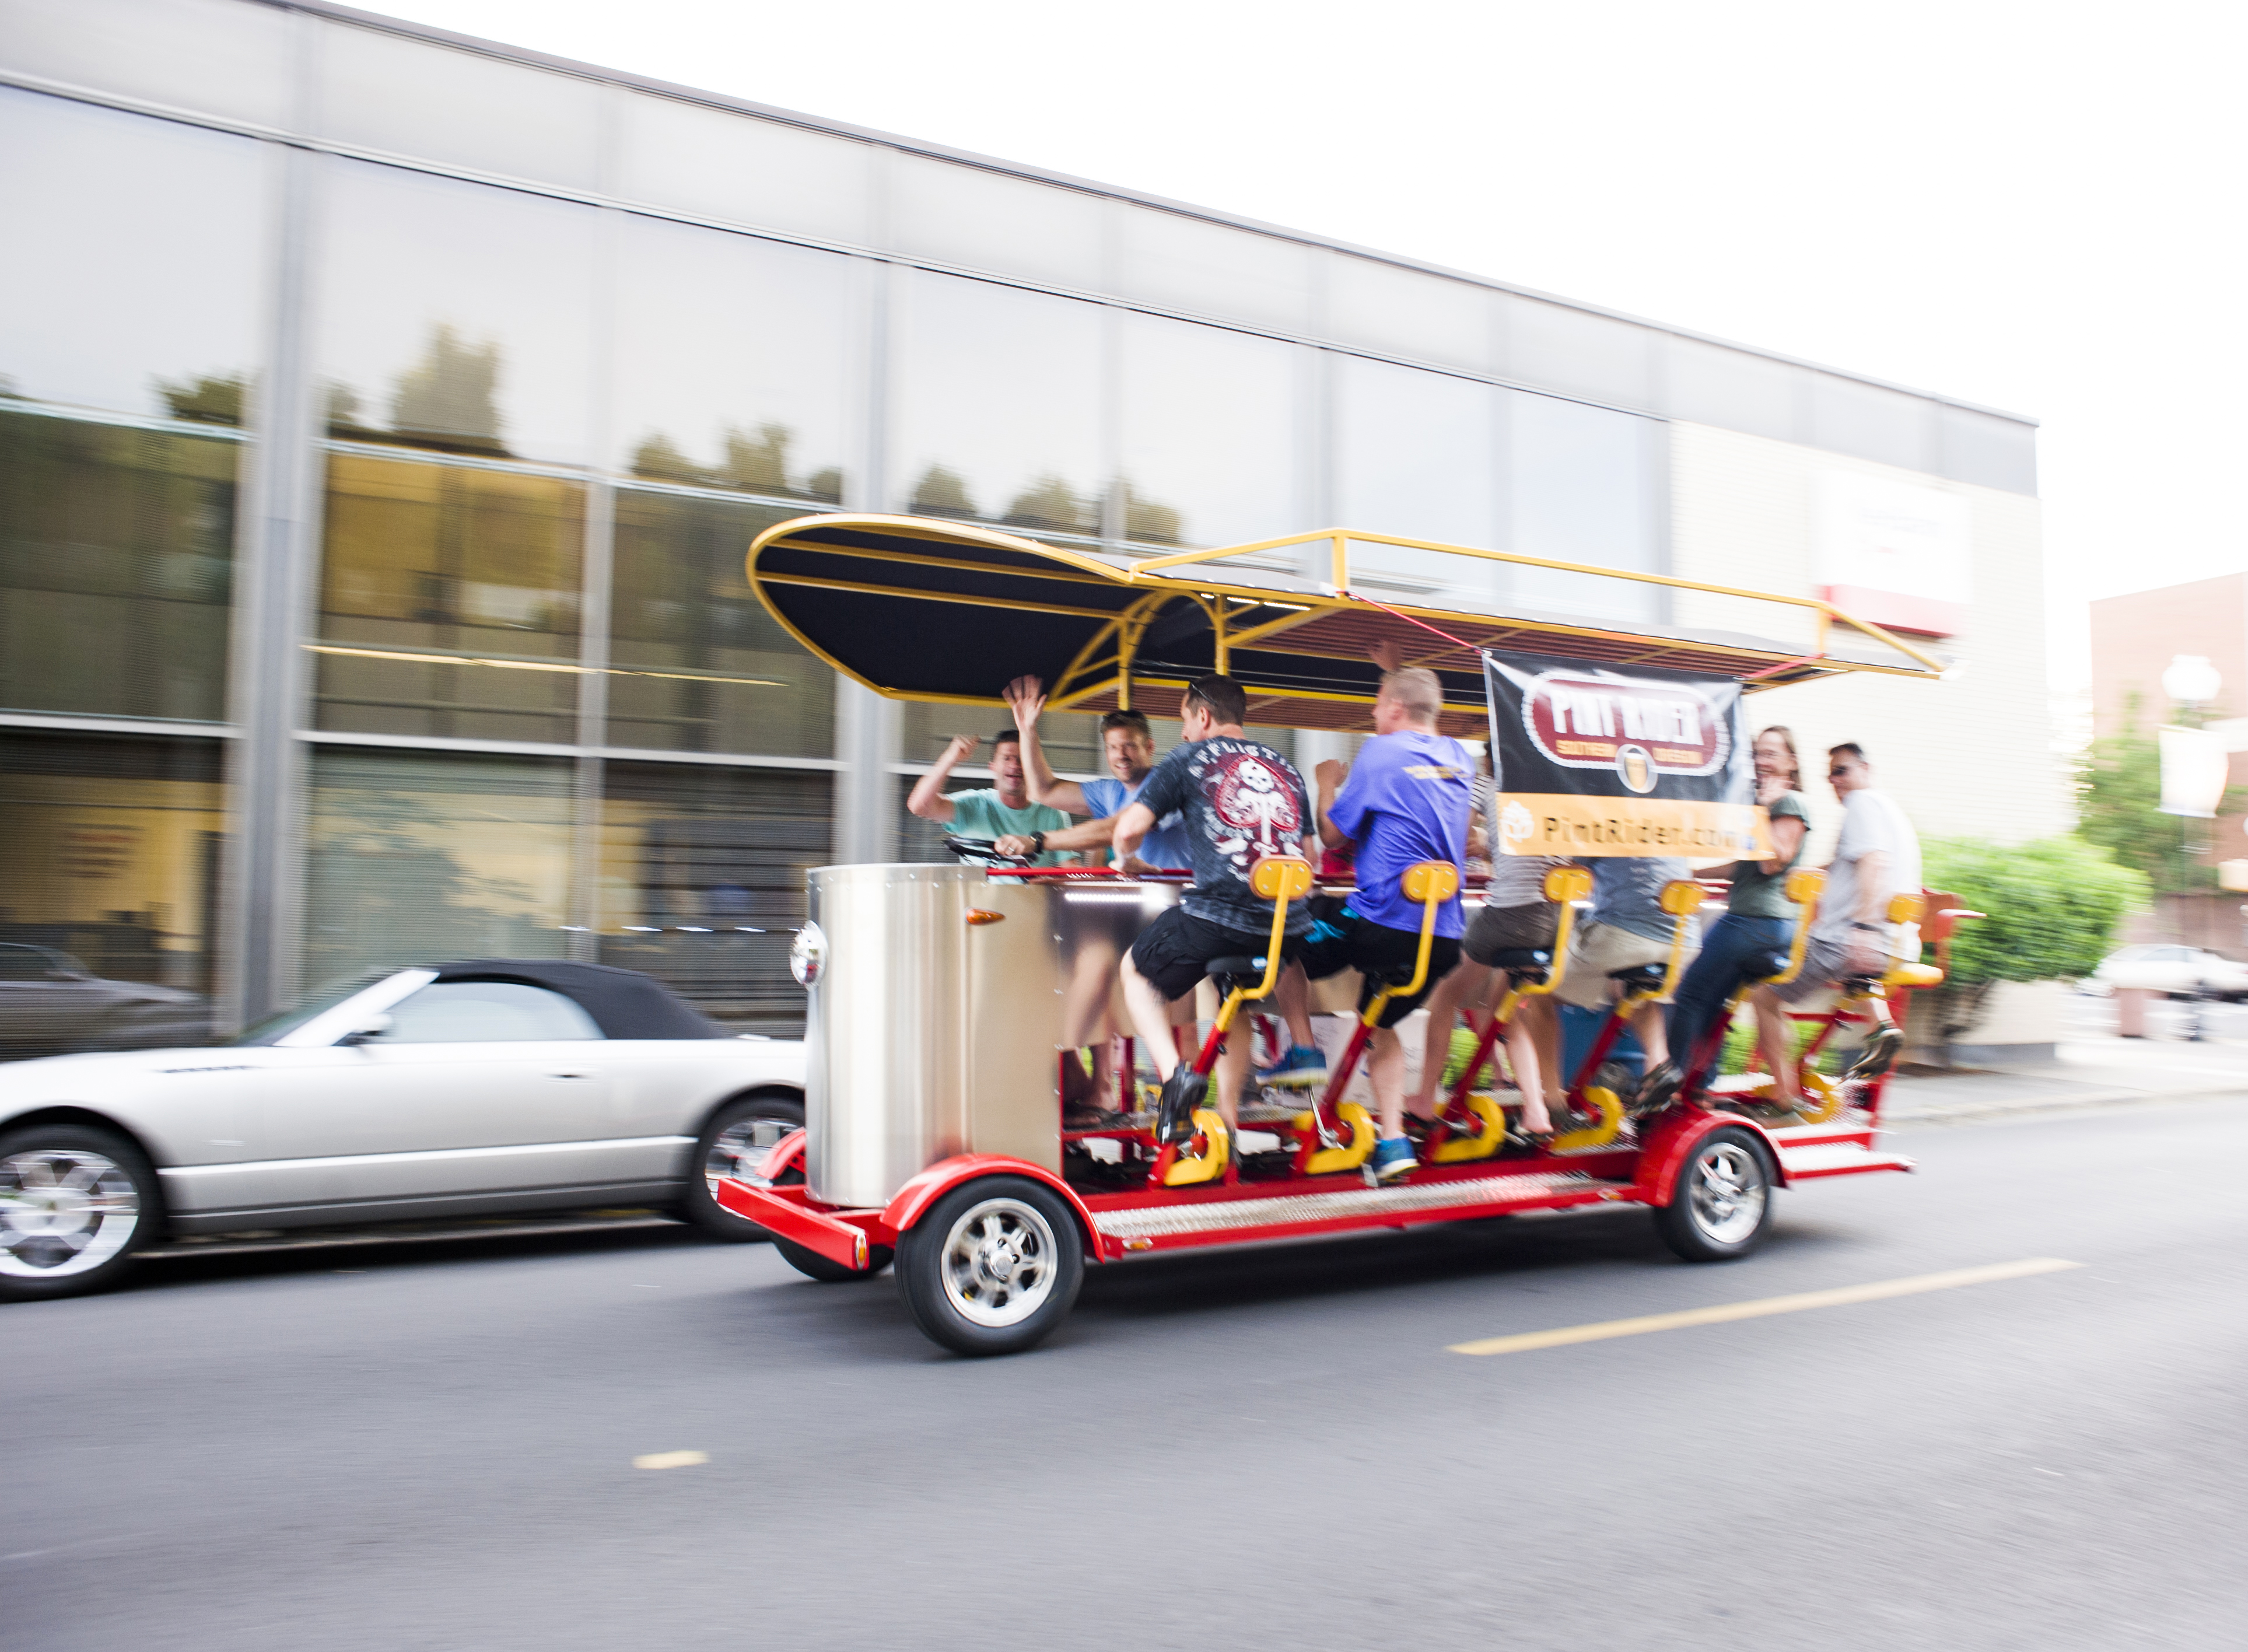 Friends enjoying a breweries tour Pint Rider in Medford